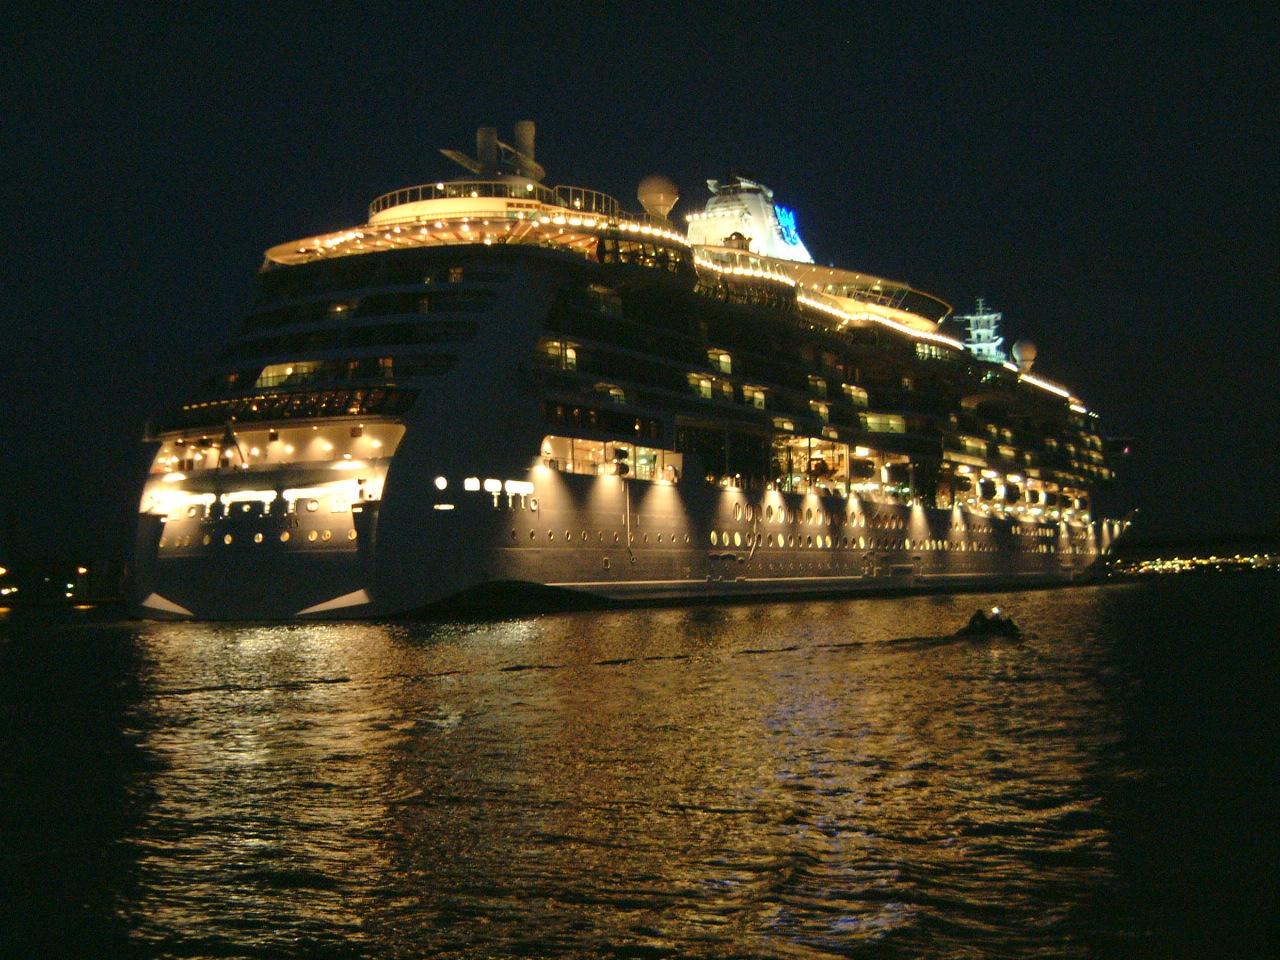 maartent boat ship cruise cruiseship lights nighttime pleasure dark